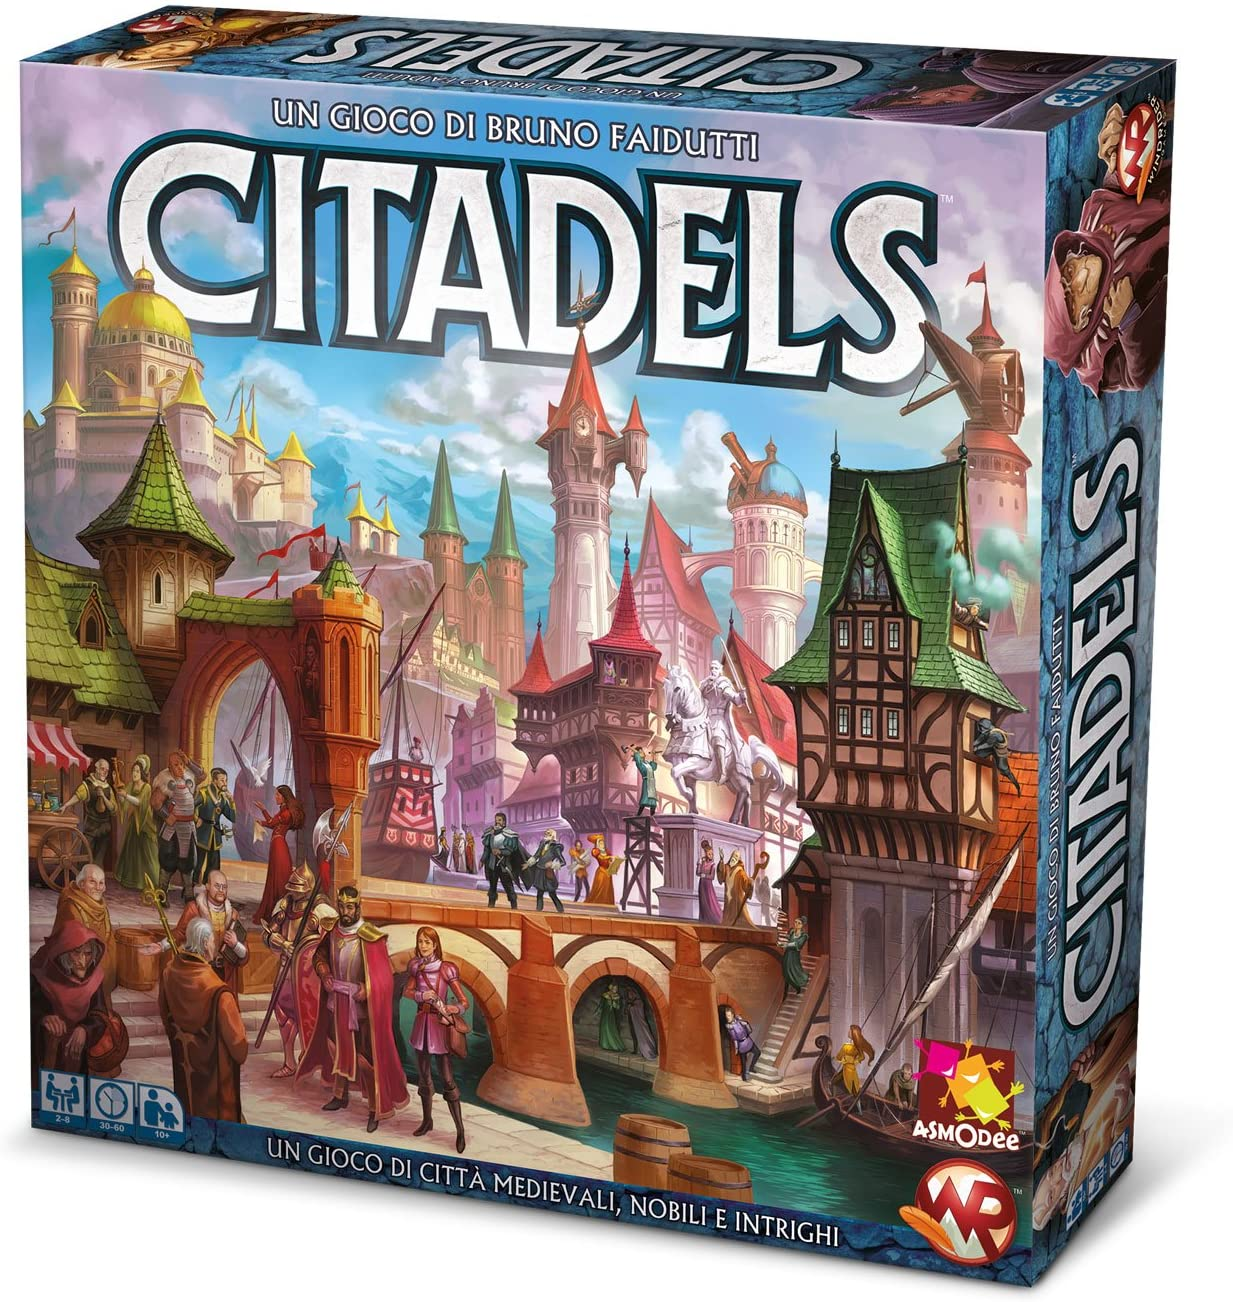 gioco da regalare durante la quarantena Citadels